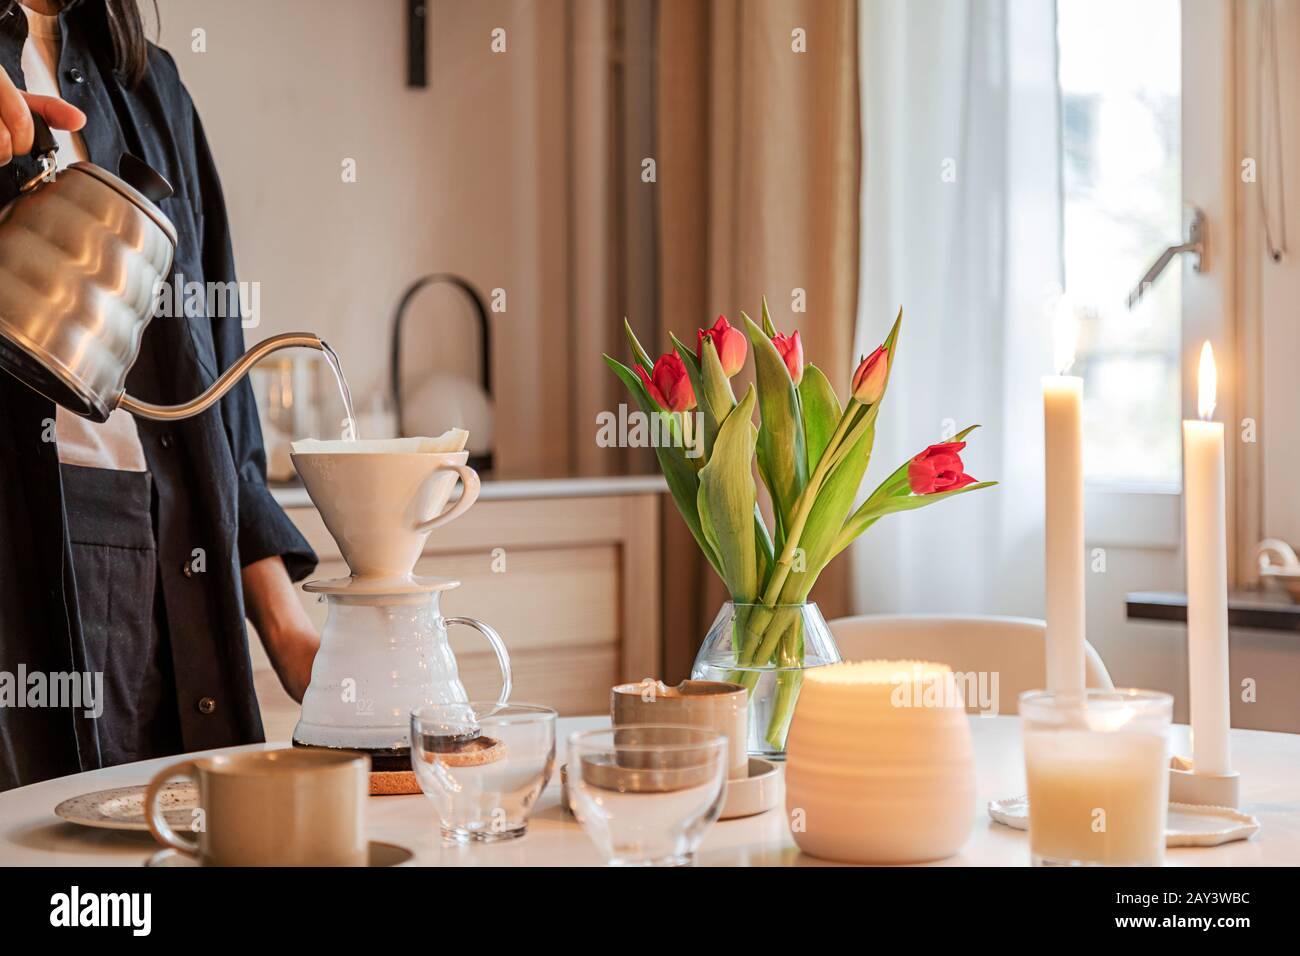 Coffee preparation on table Stock Photo